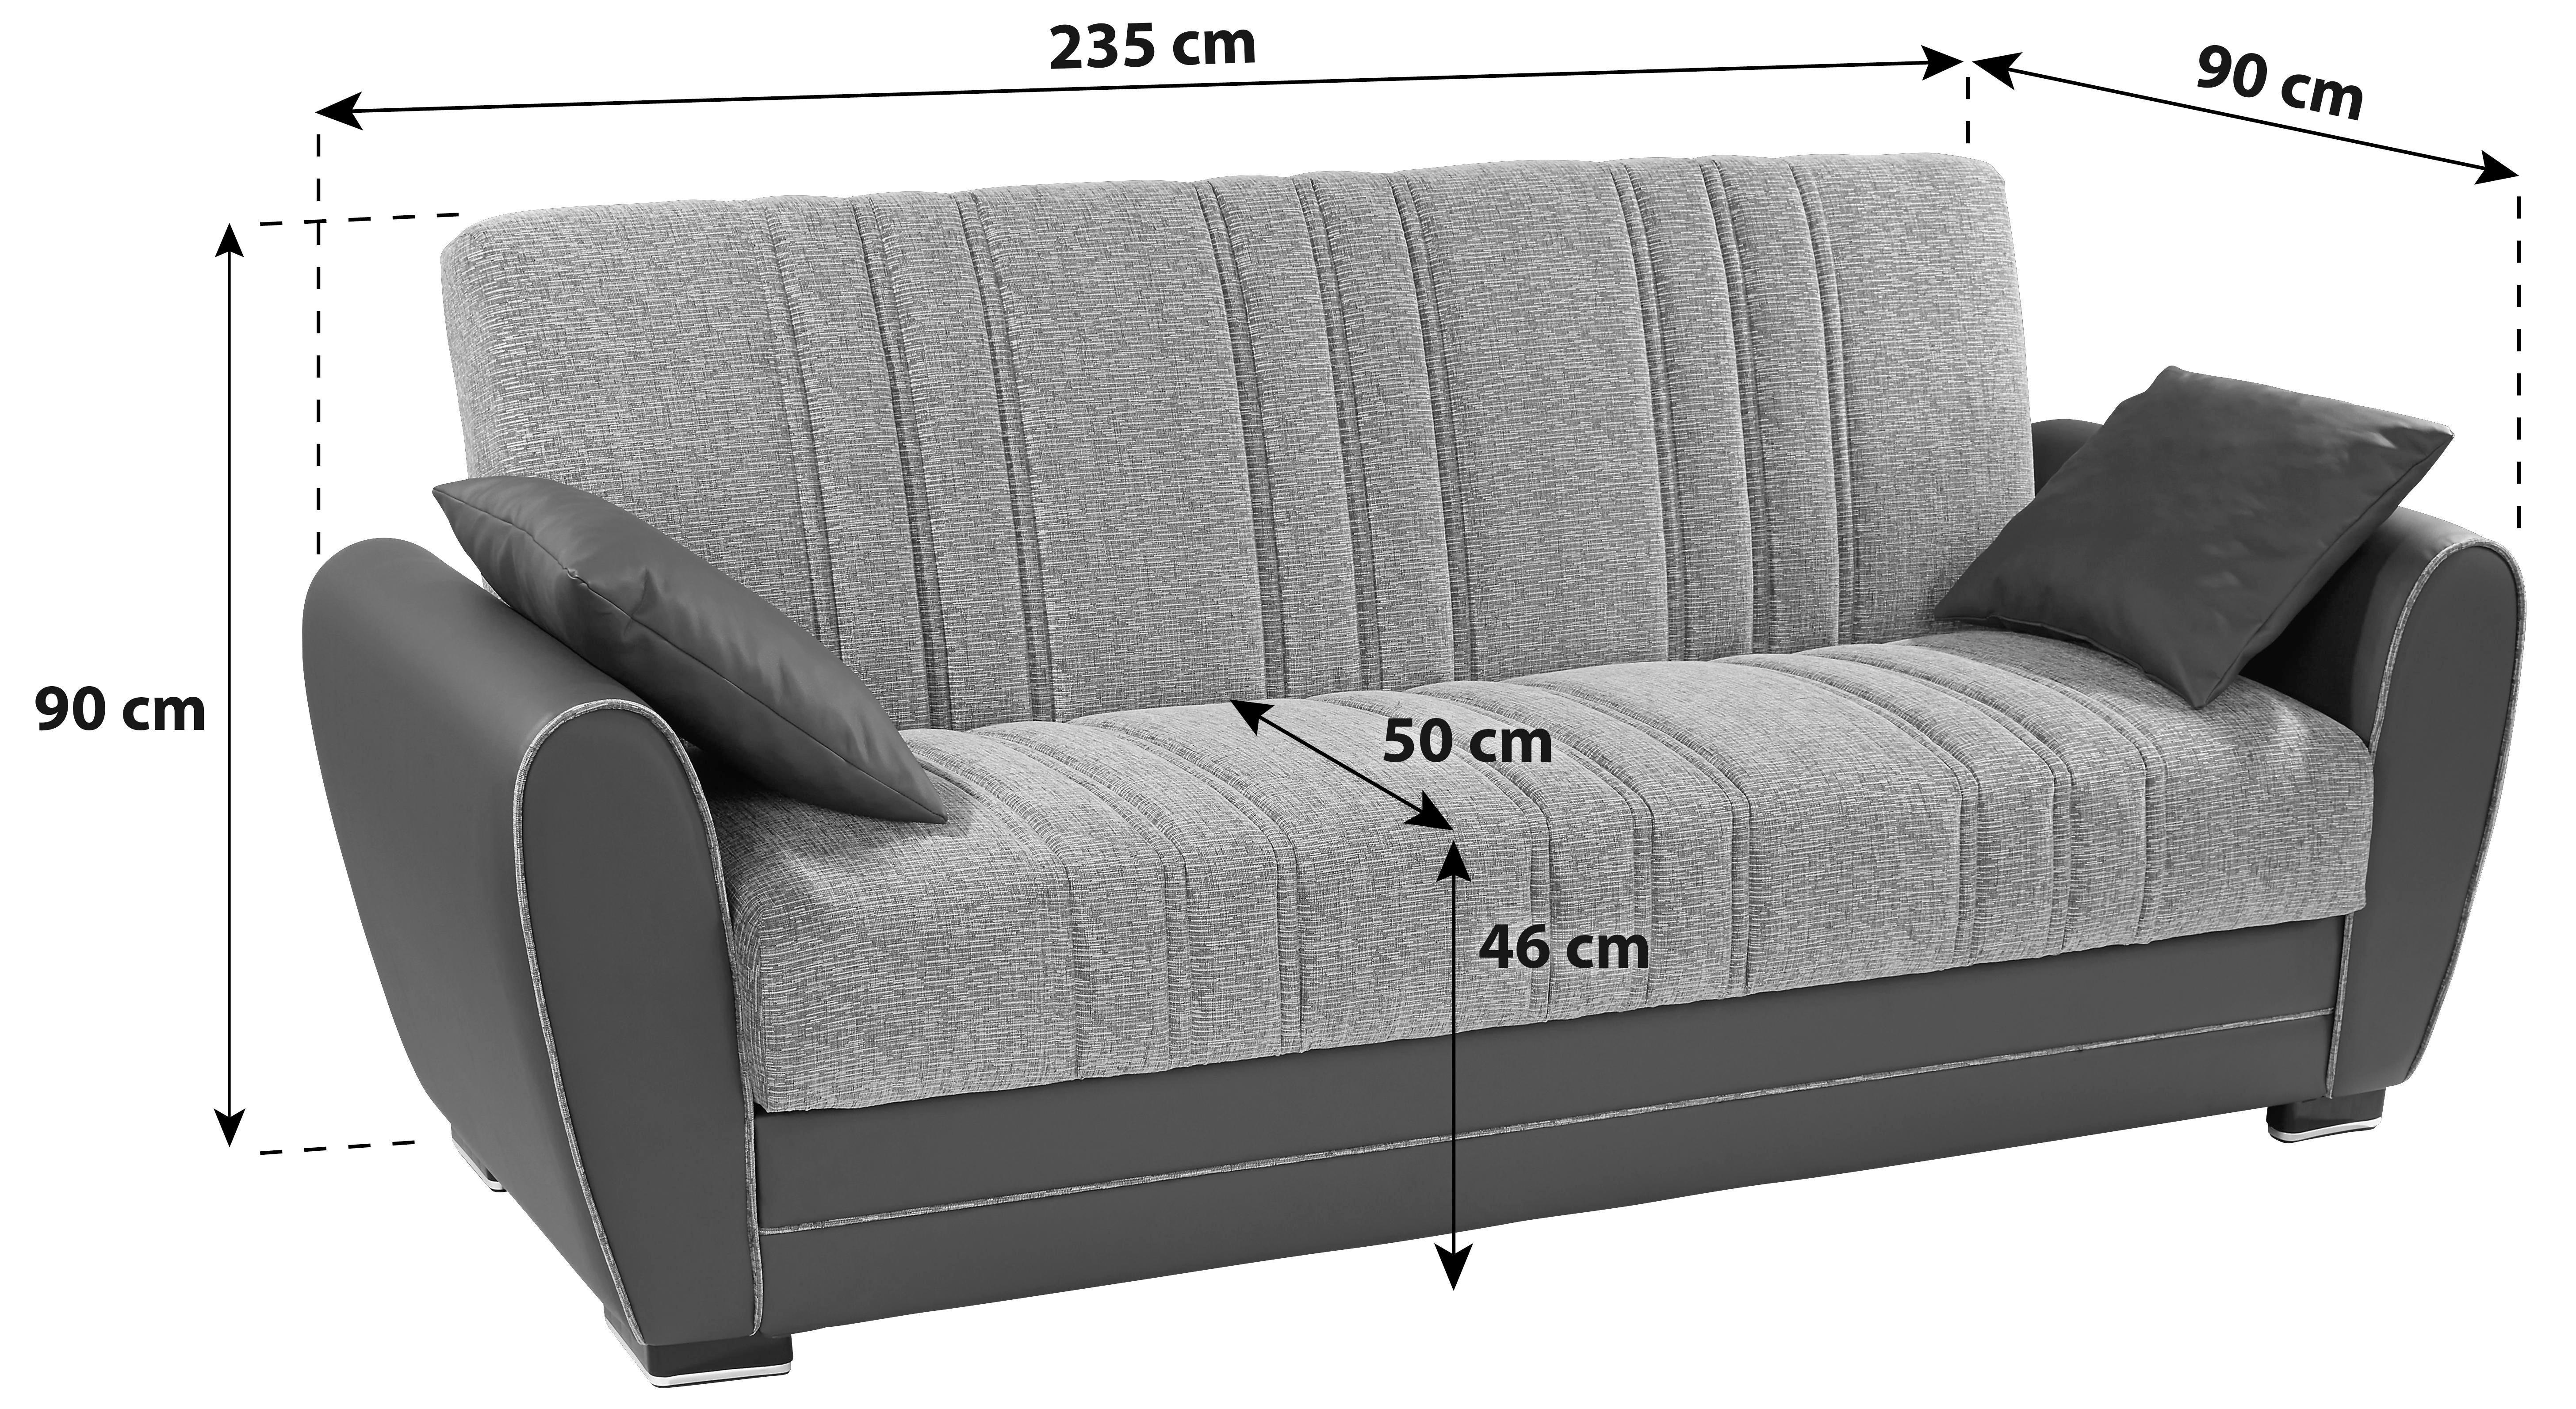 Rozkládací Pohovka Pelin - černá/fialová, kov/dřevo (235/85/90cm)